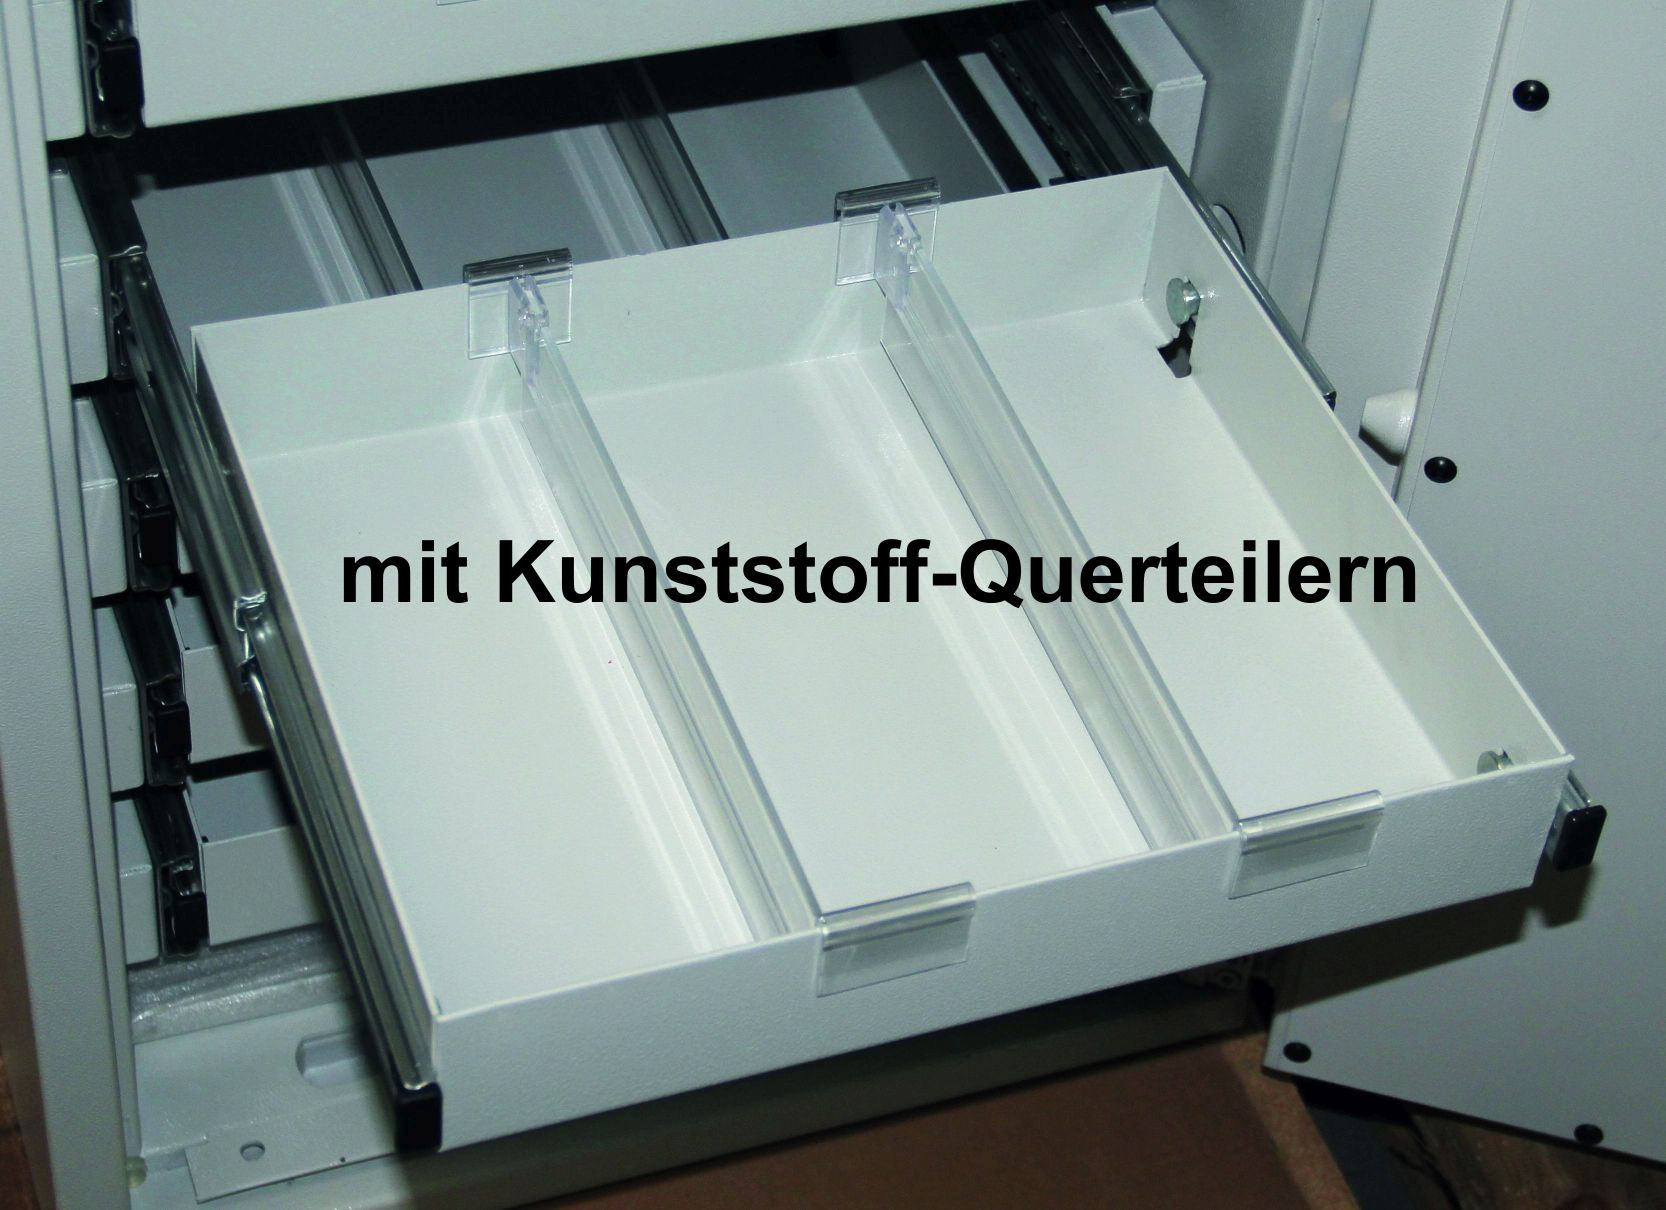 mit Kunststoff-Querteiler + 69,00 EUR ab  1.513,00 €